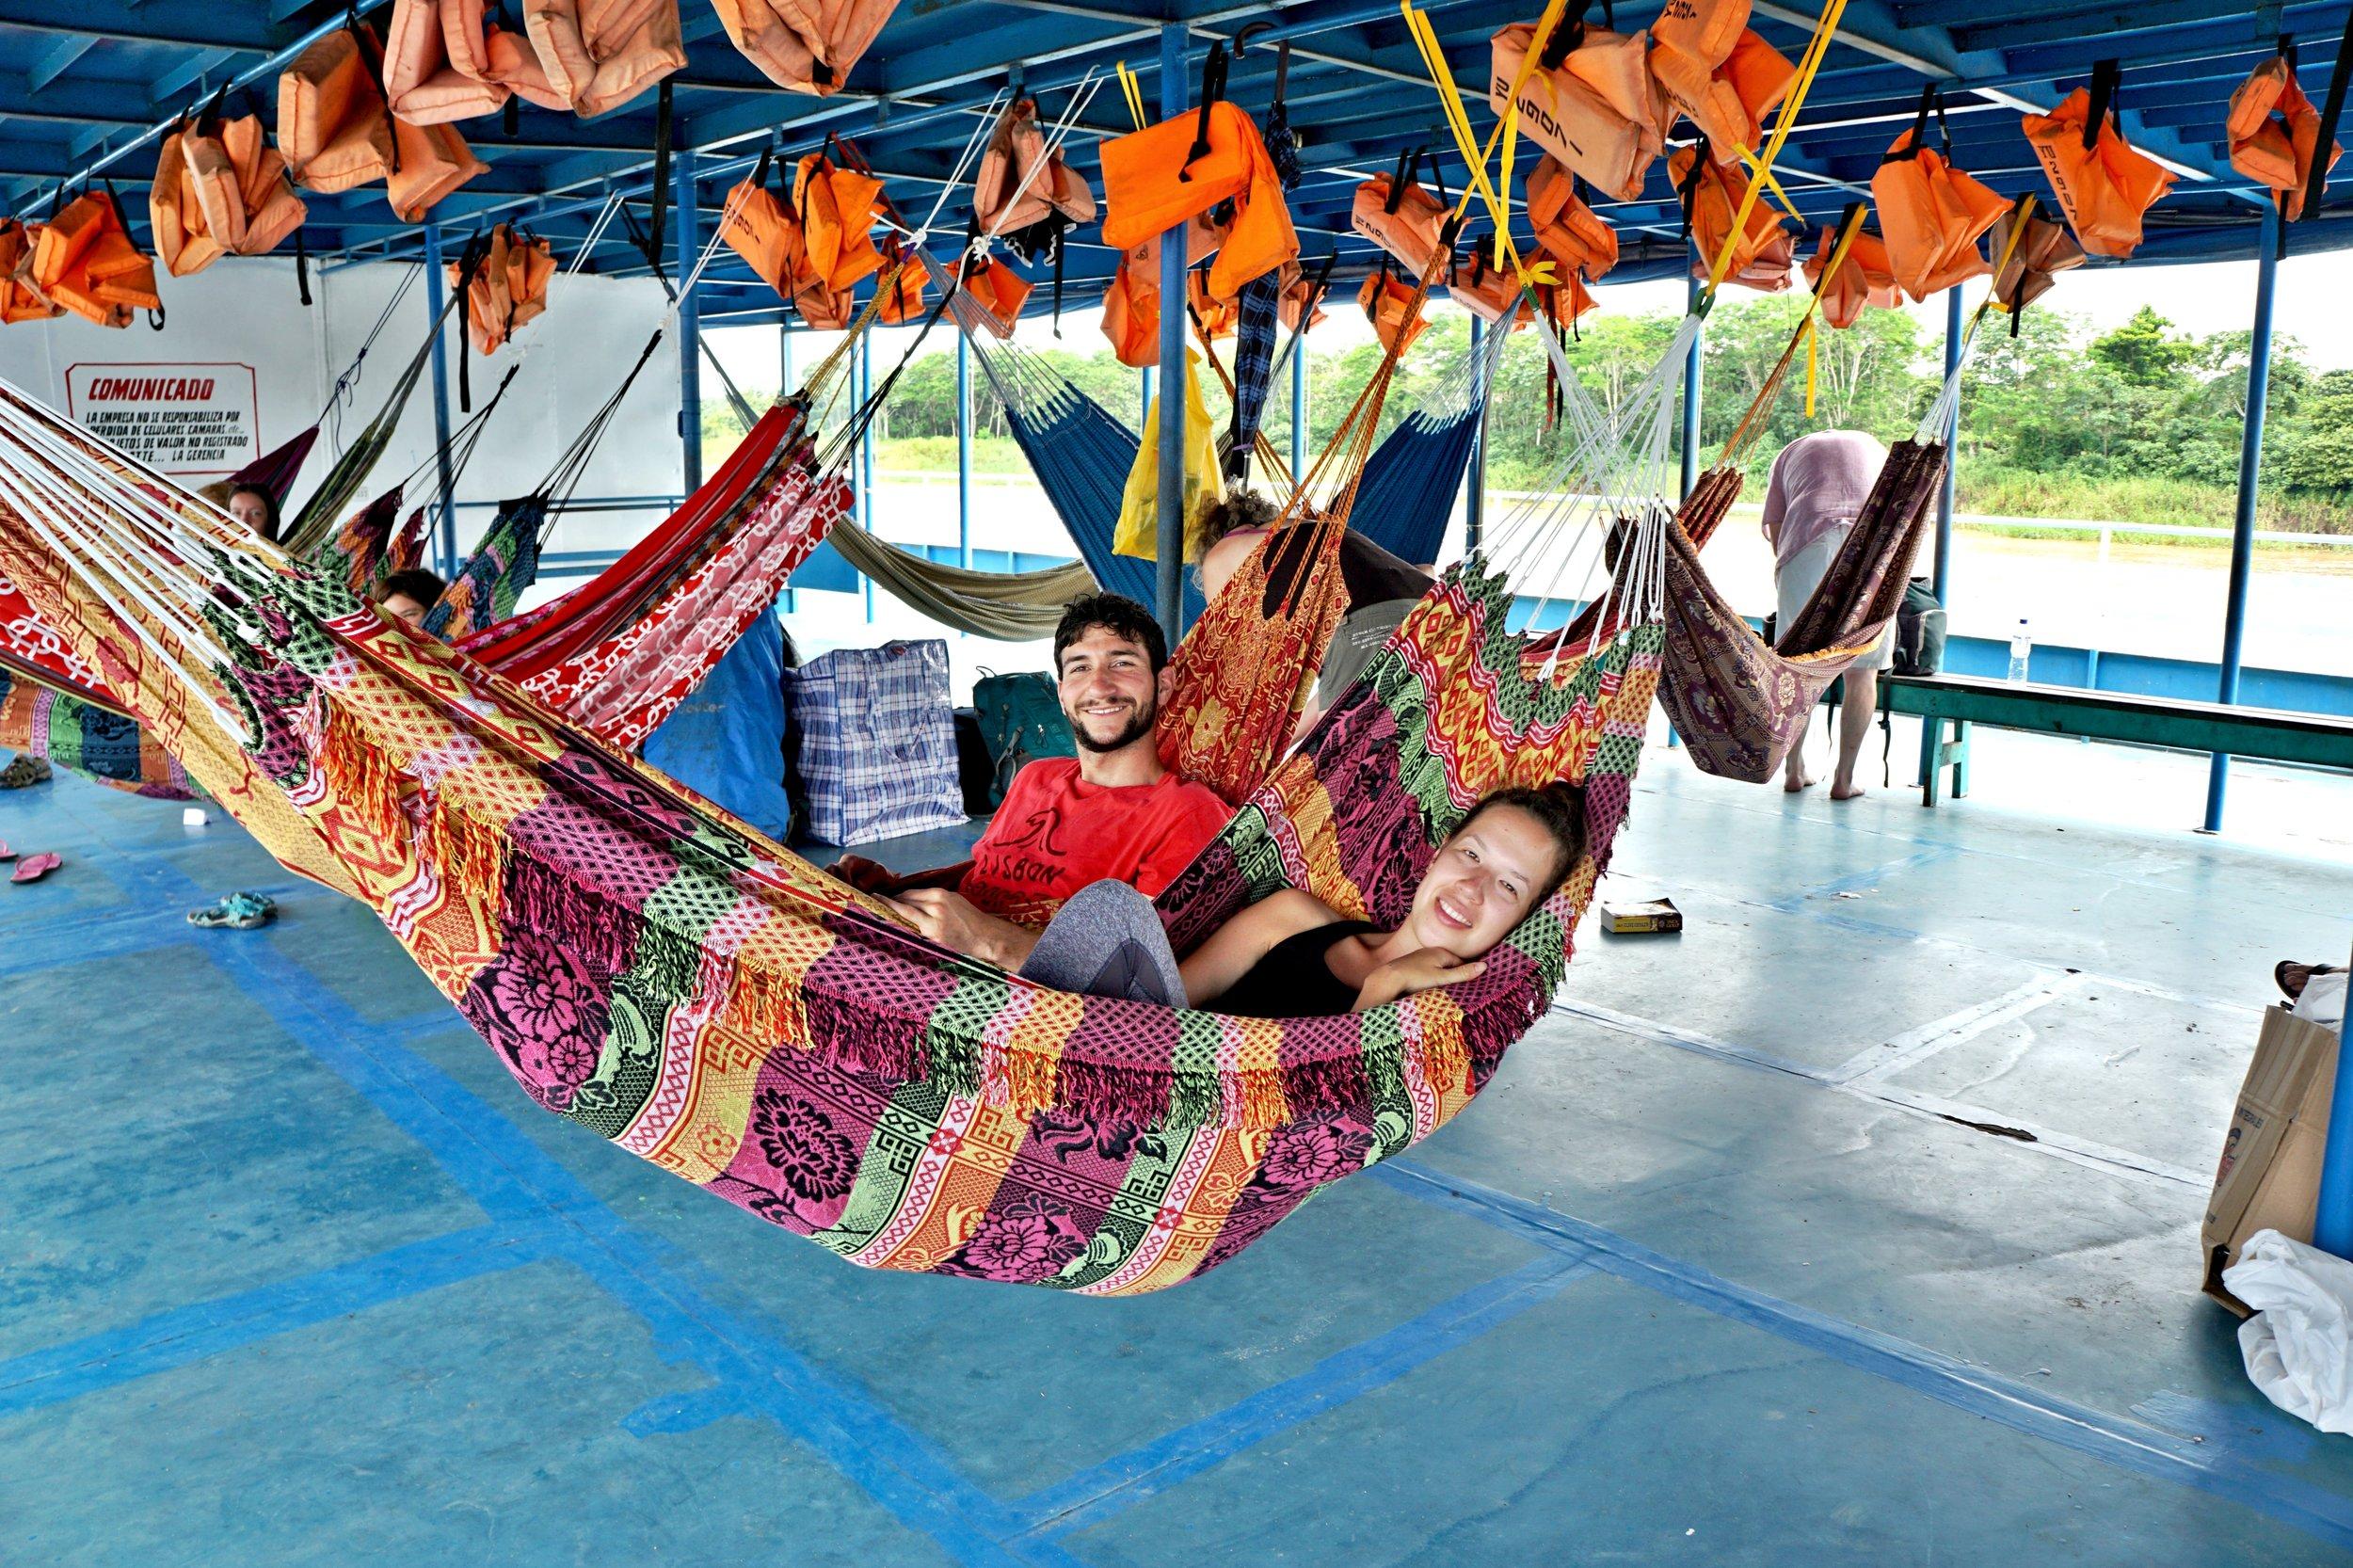 Living the hammock life